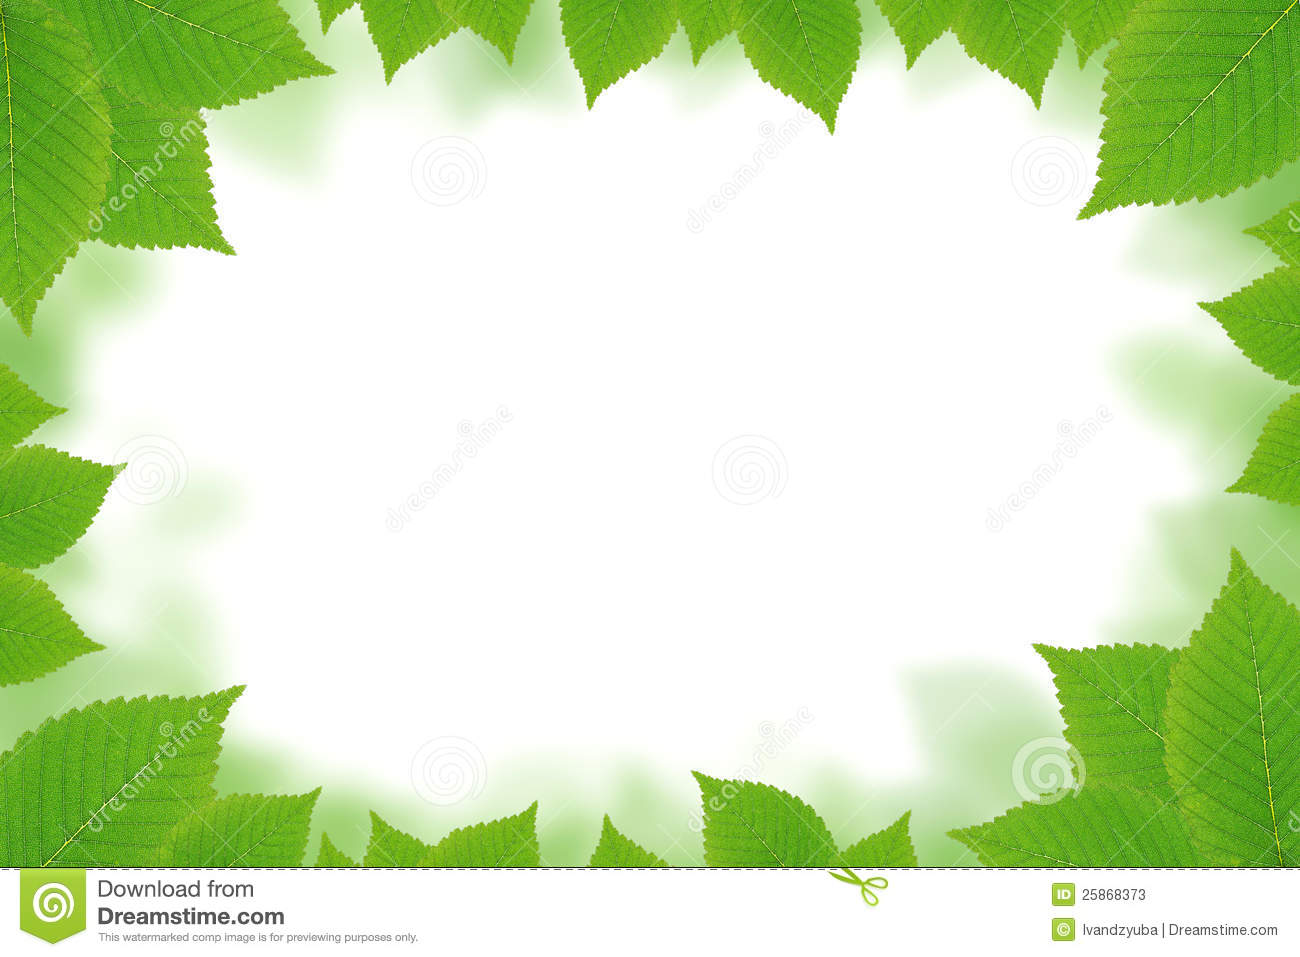 Green Leaf Wallpaper Border HD Wallpapers on picsfaircom 1300x957